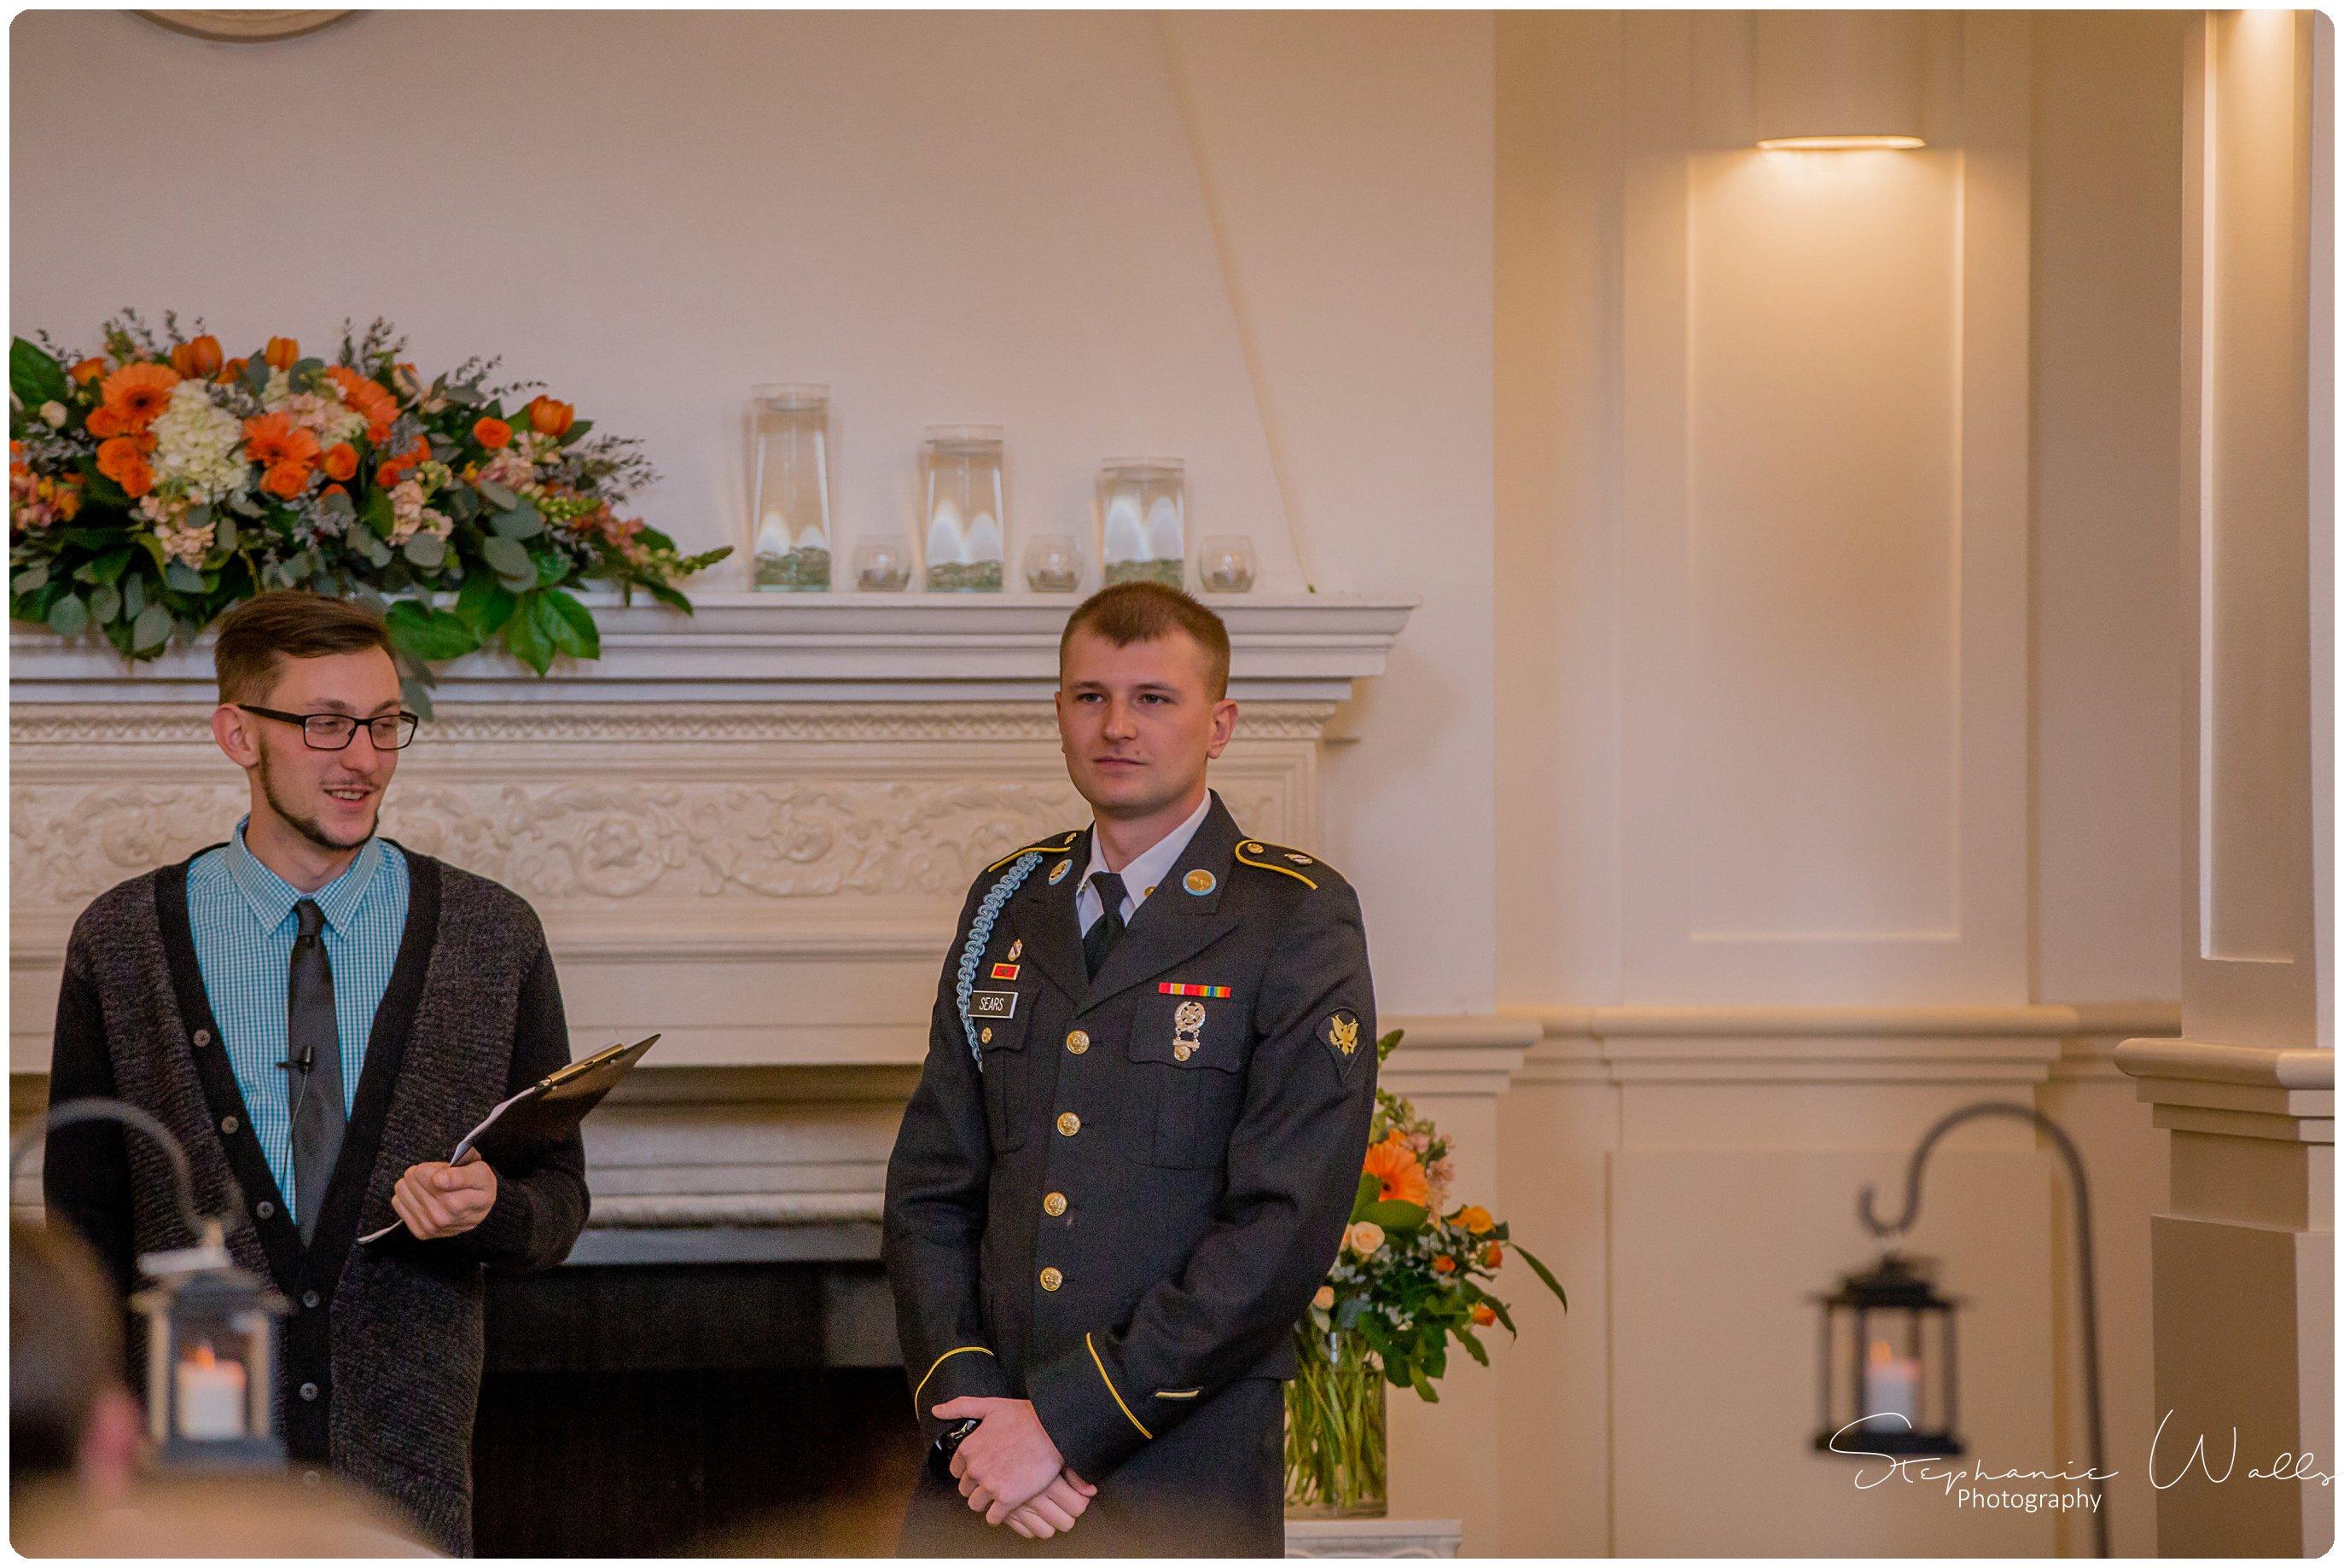 Sears Ceremony 011 The Hero & The Starlet | Monte Cristo Ballroom | Stephanie Walls Photography Weddings